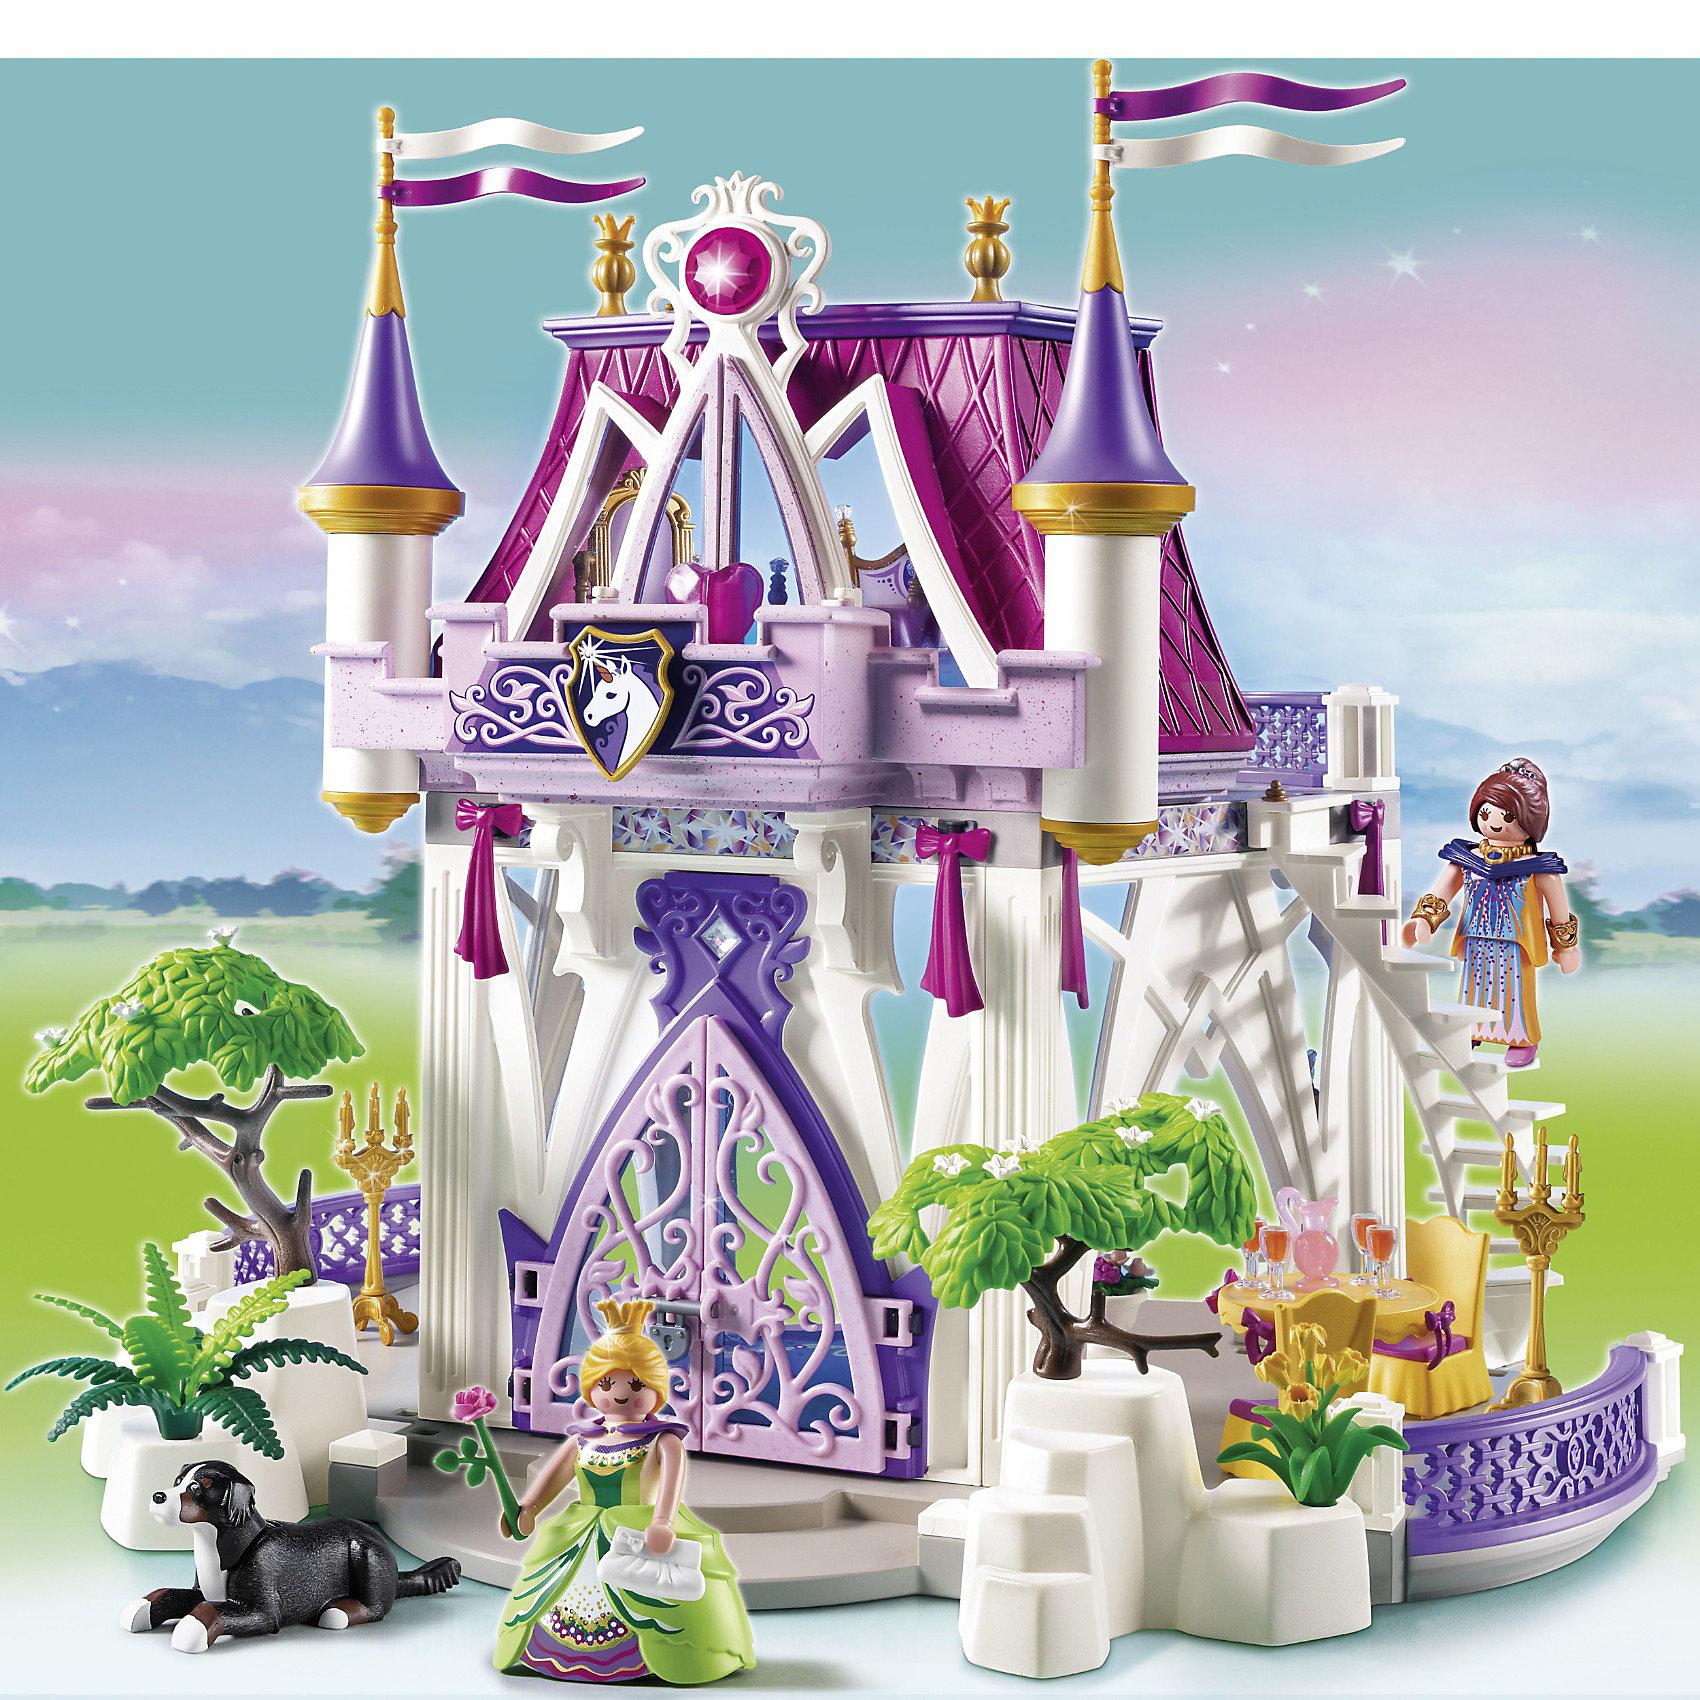 PLAYMOBIL 5474 Замок кристалла: Замок Единорога